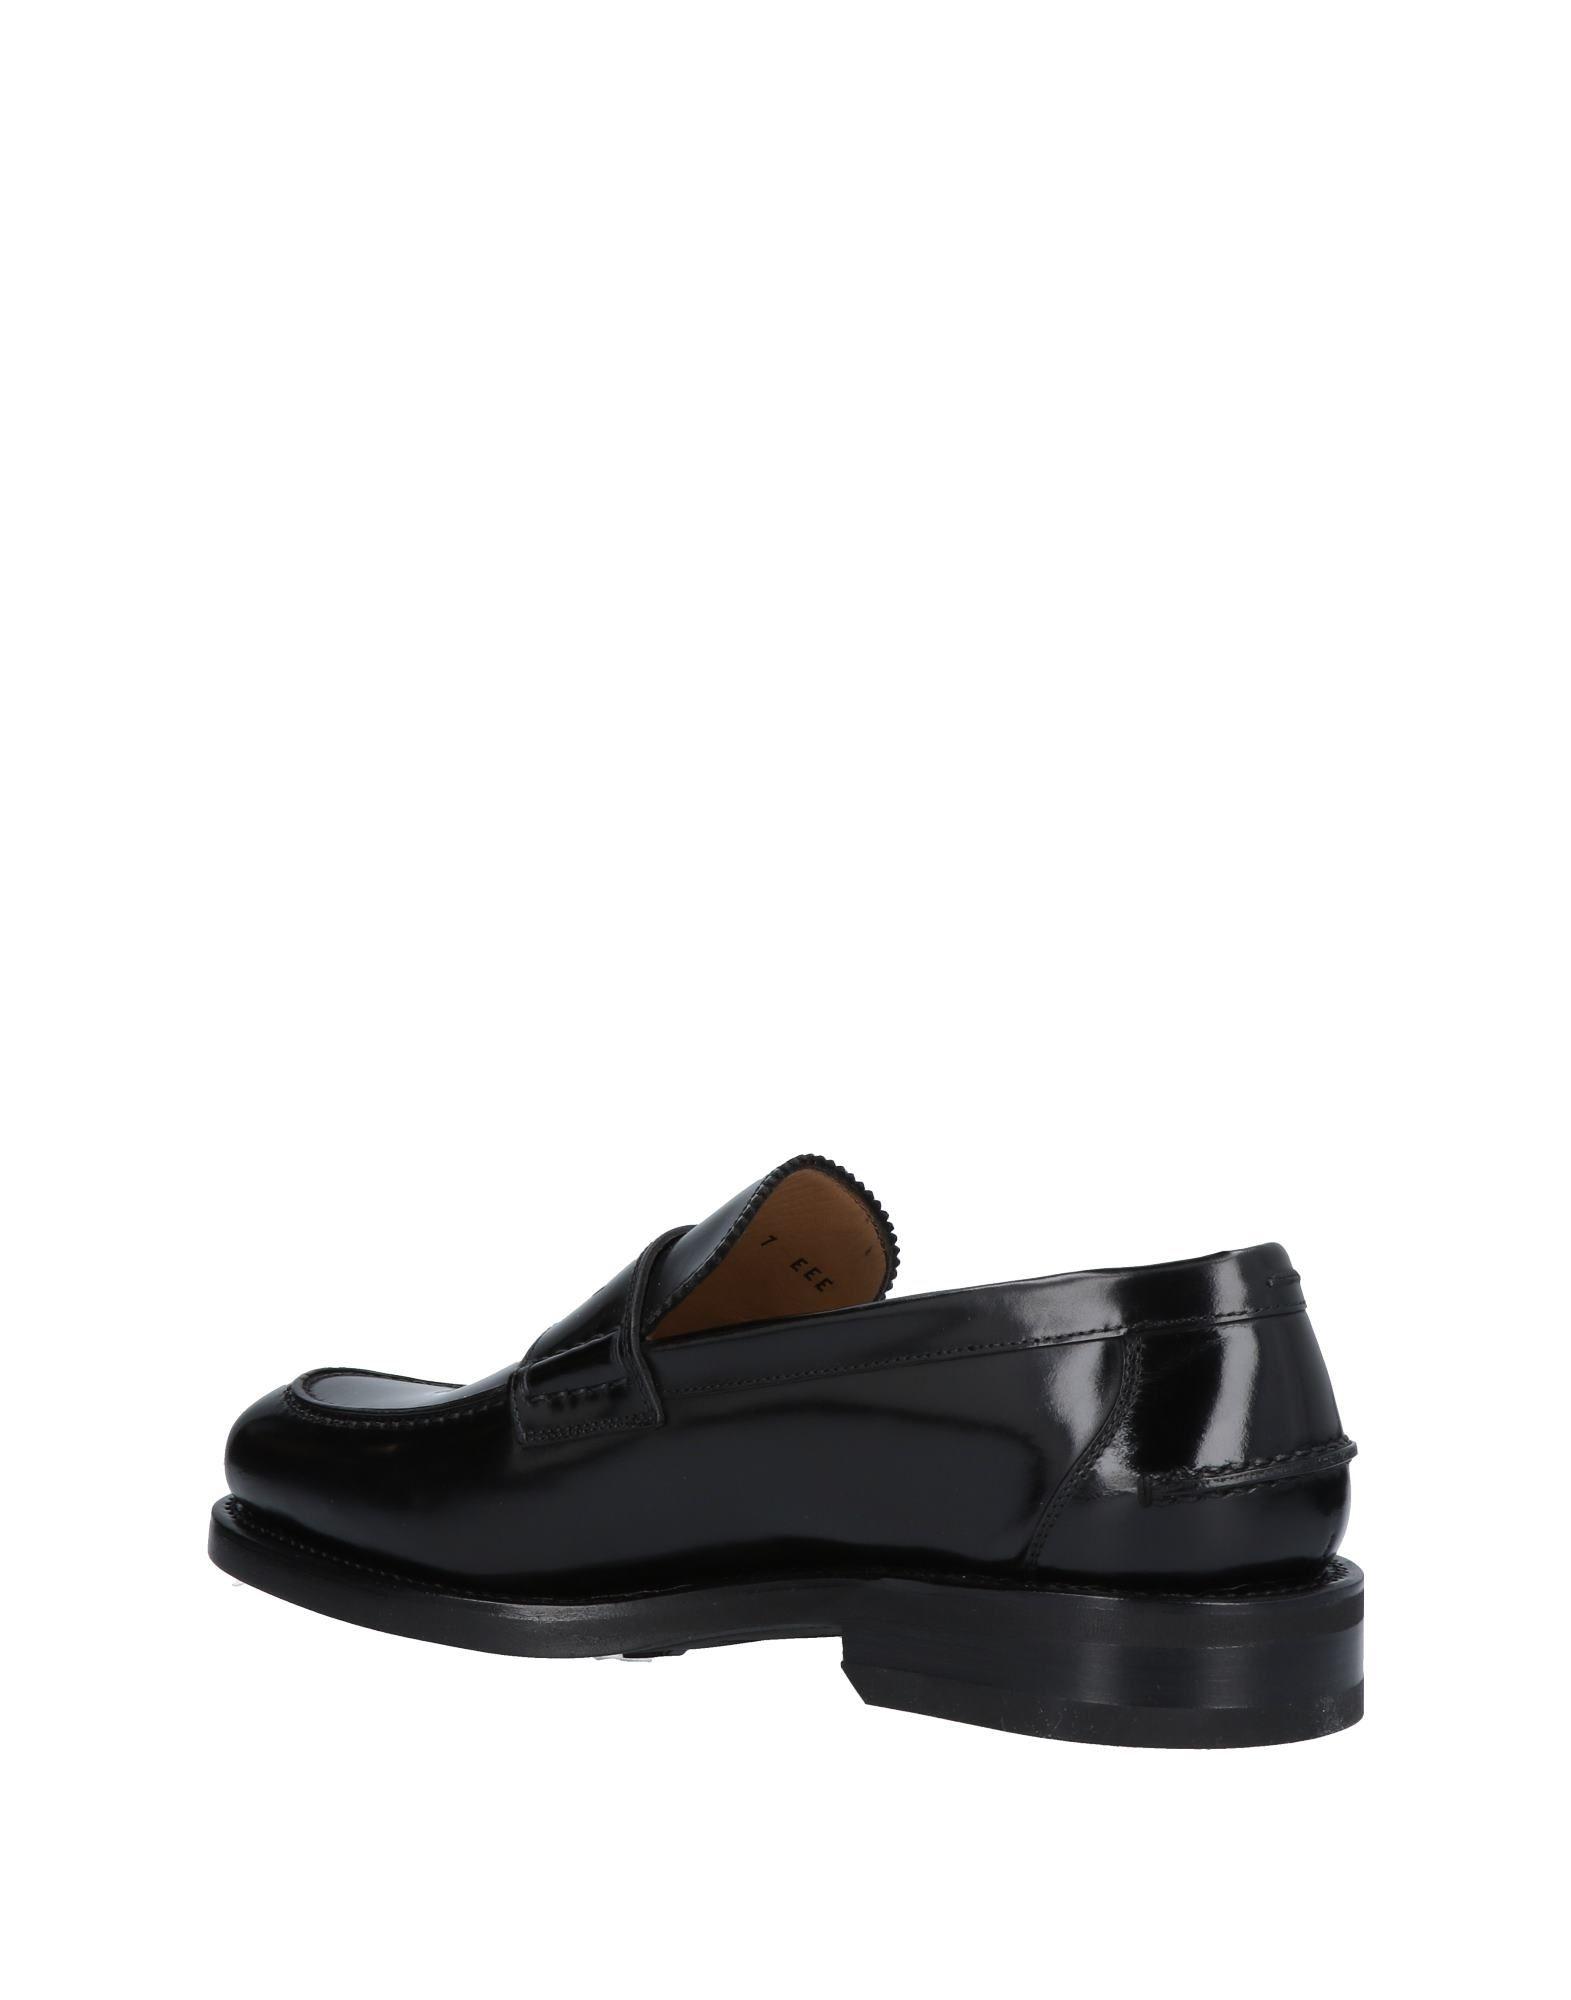 Salvatore Ferragamo Mokassins Herren  11421898JW Gute Gute Gute Qualität beliebte Schuhe cc810a